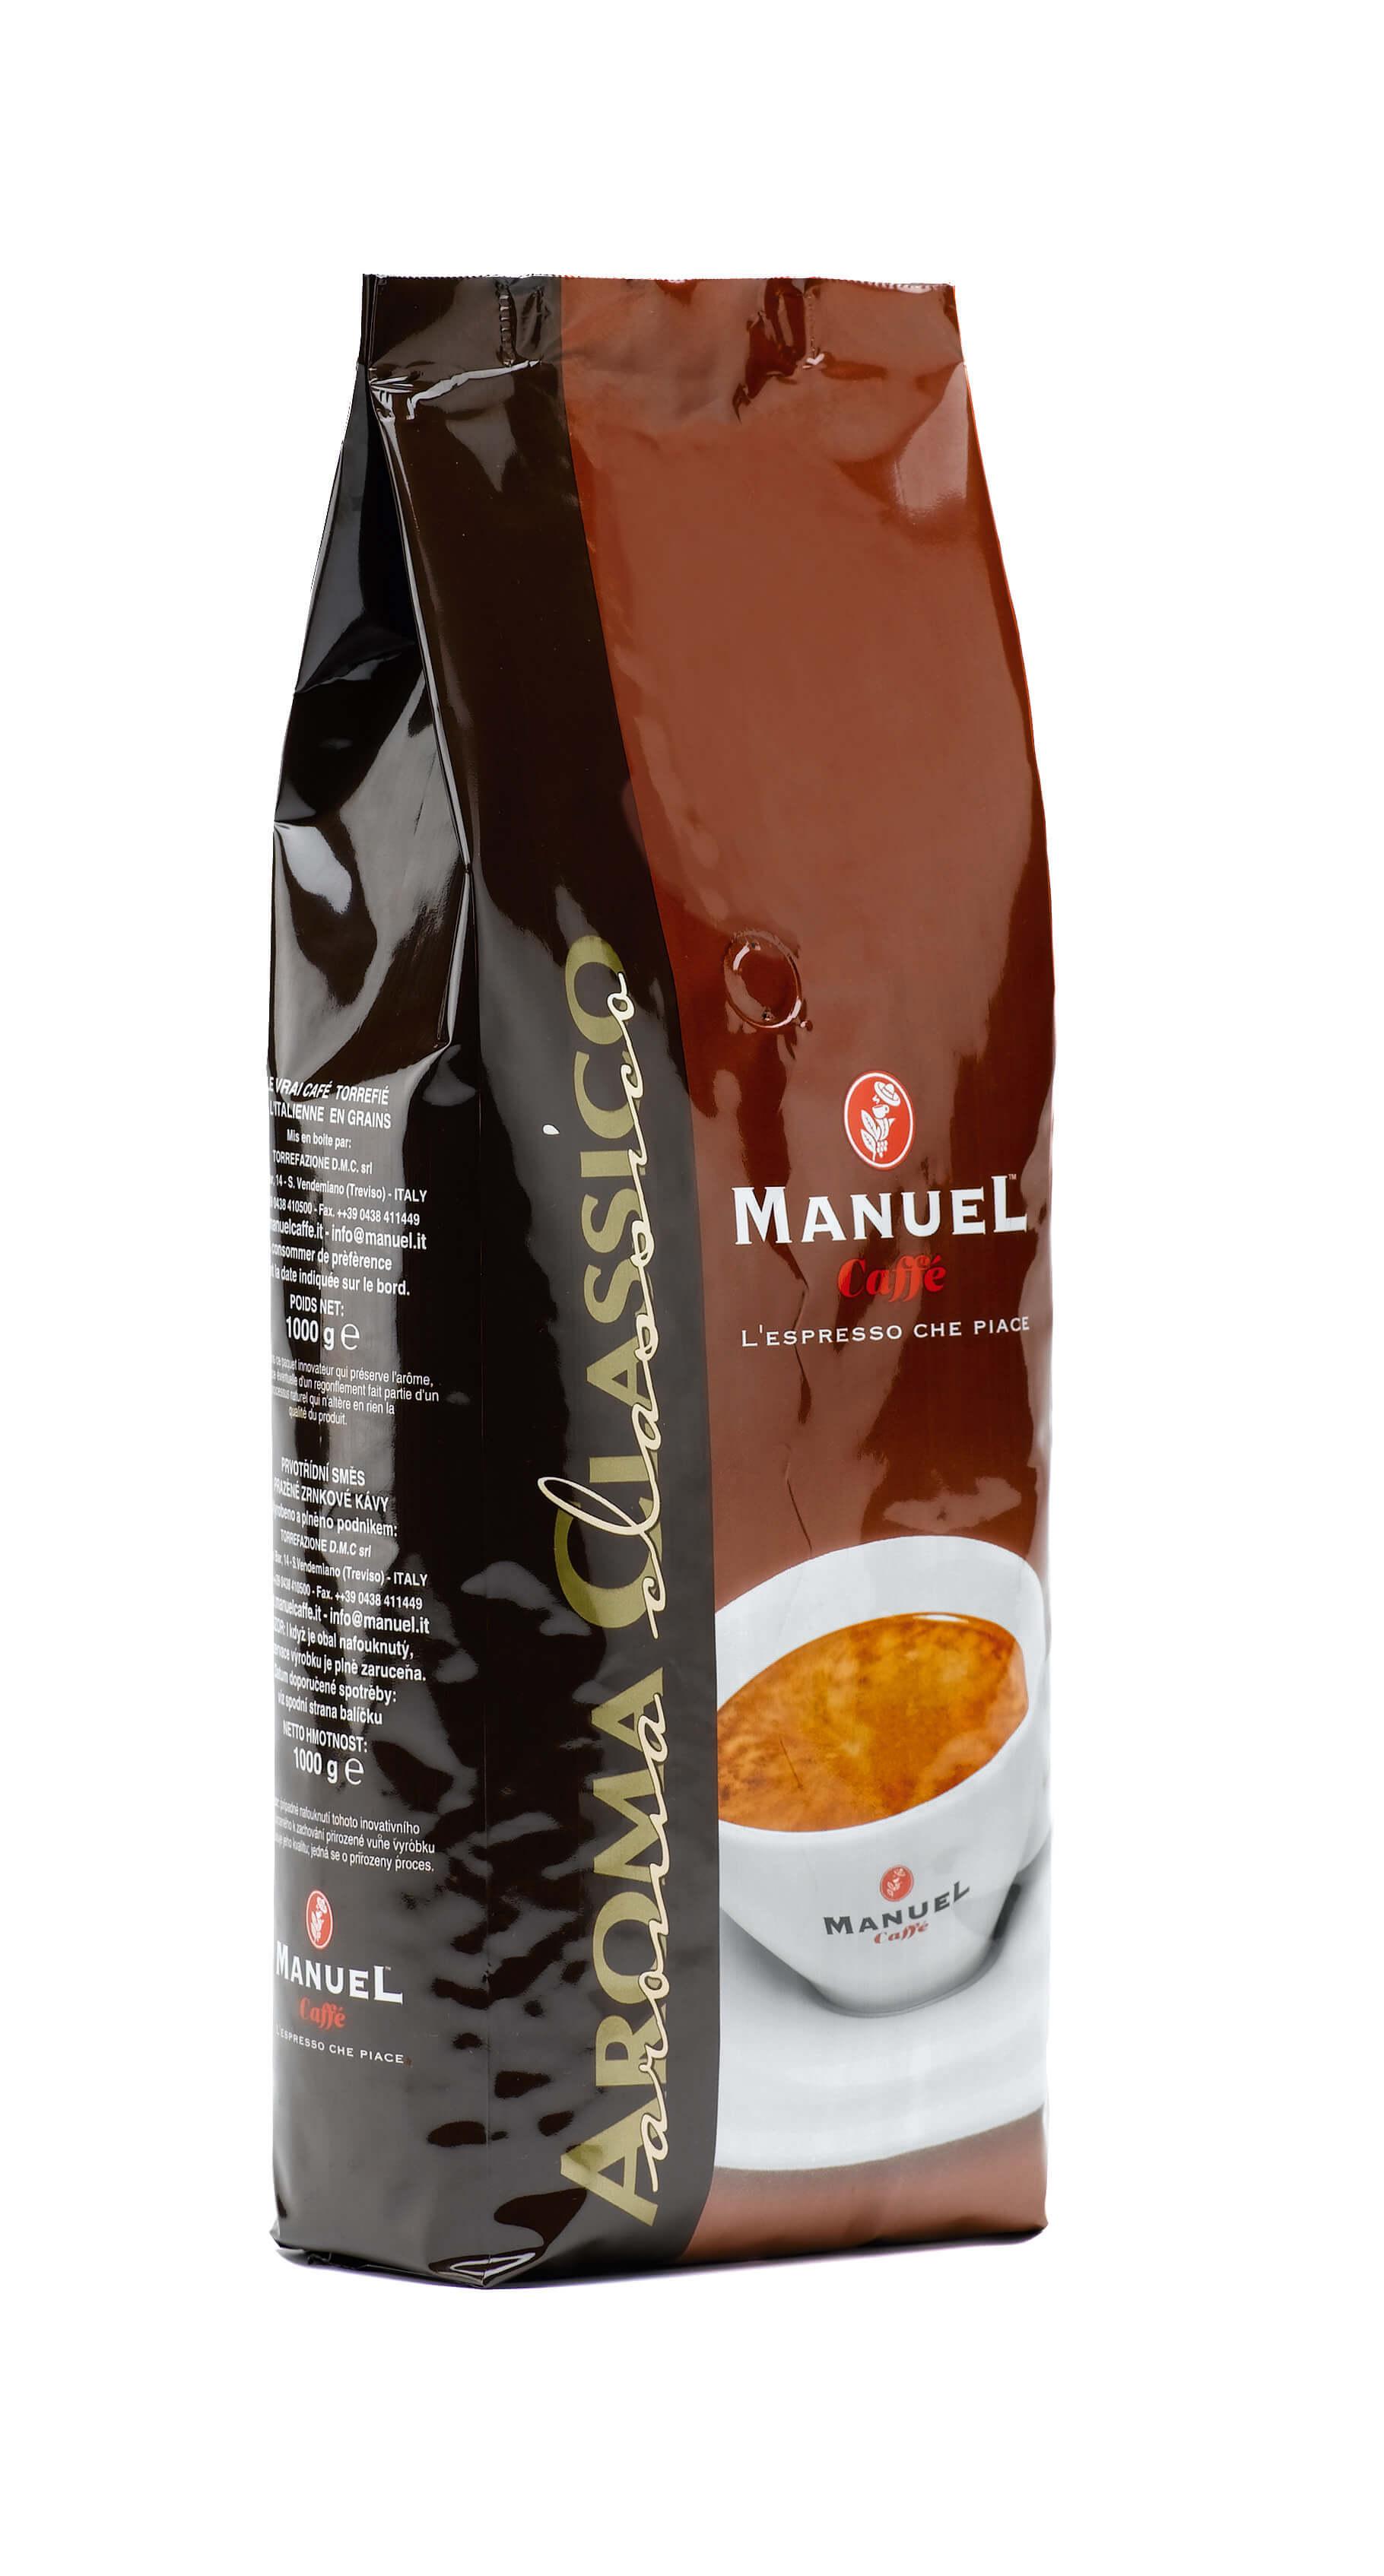 Manuel Caffe Classico 1kg in ganzer Kaffeebohne